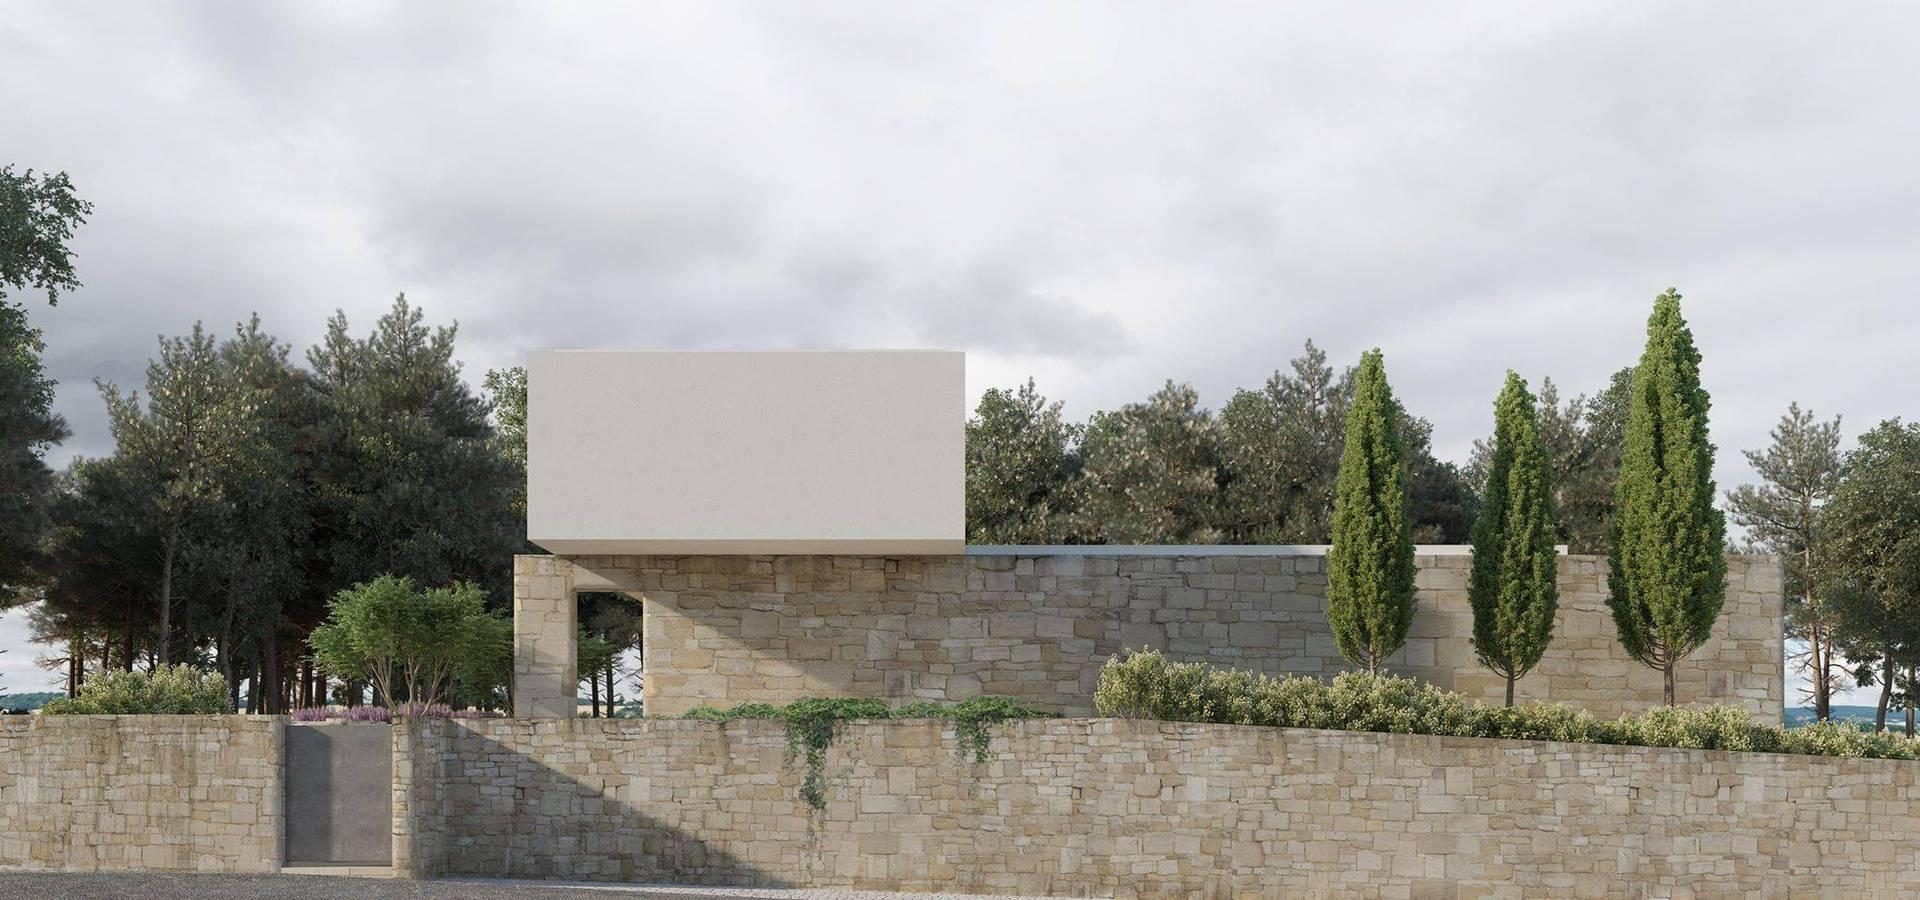 Paulo Gomes, arquitectura